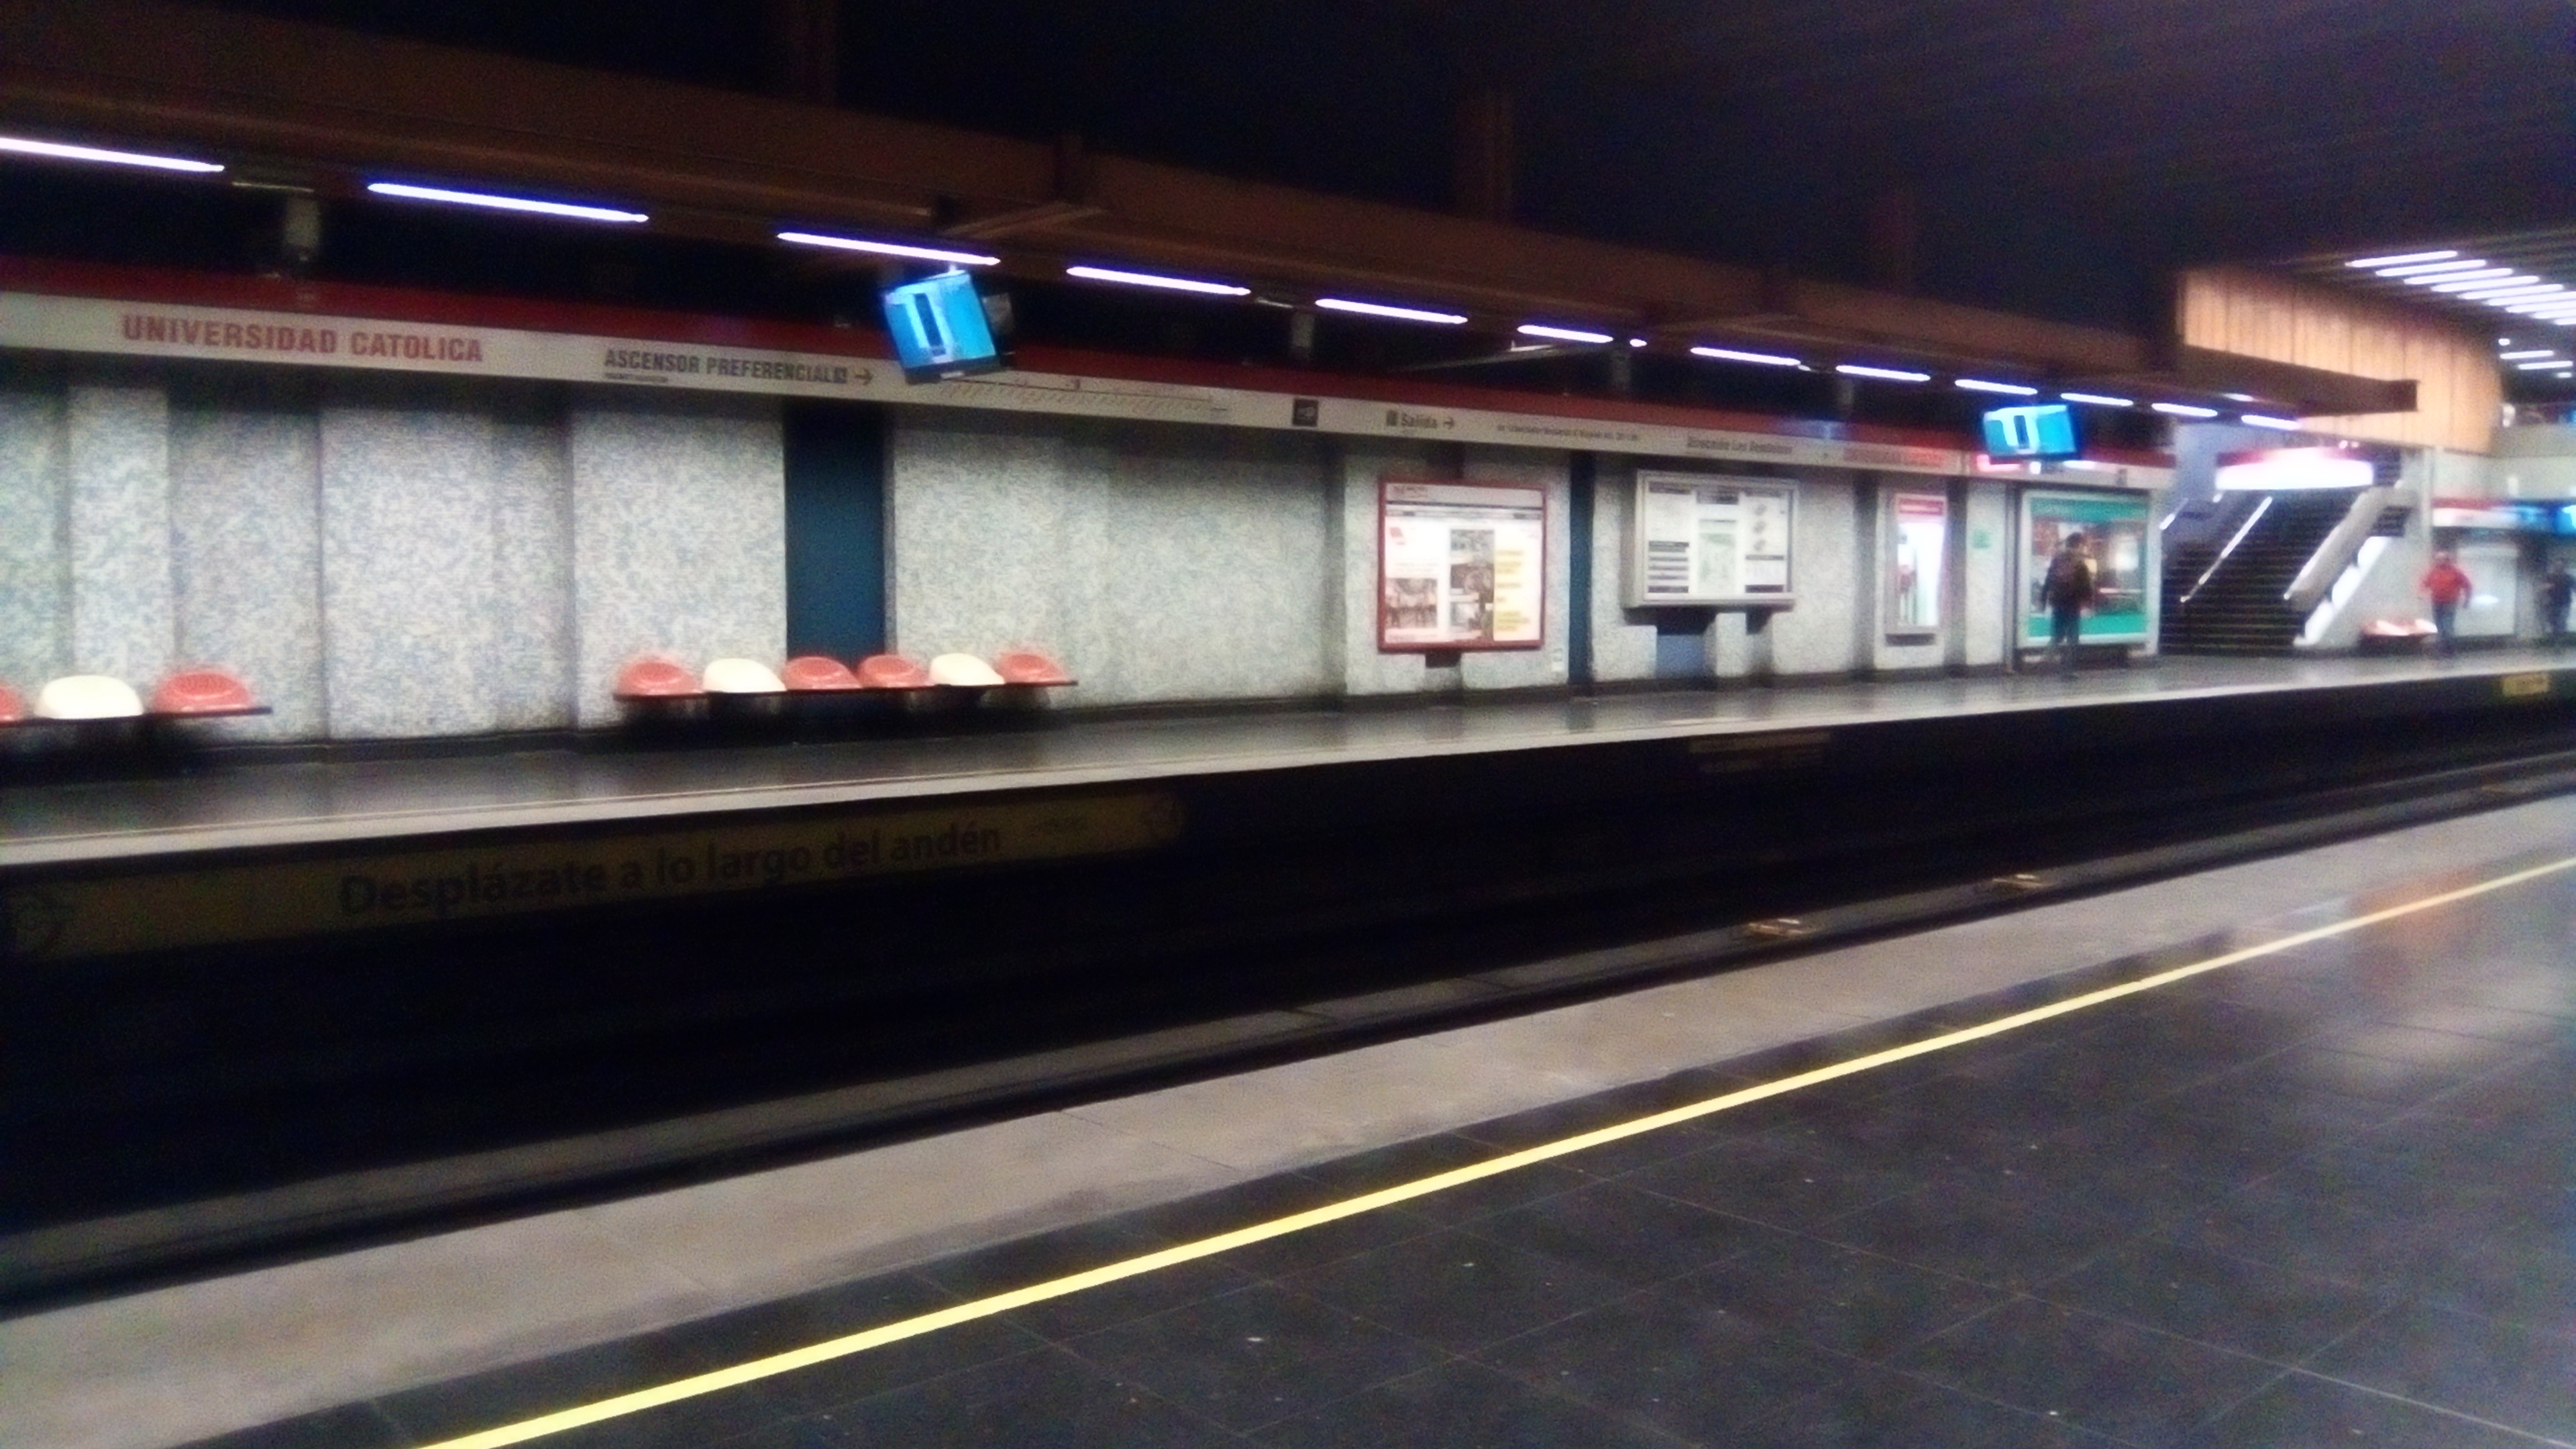 Universitat underground station